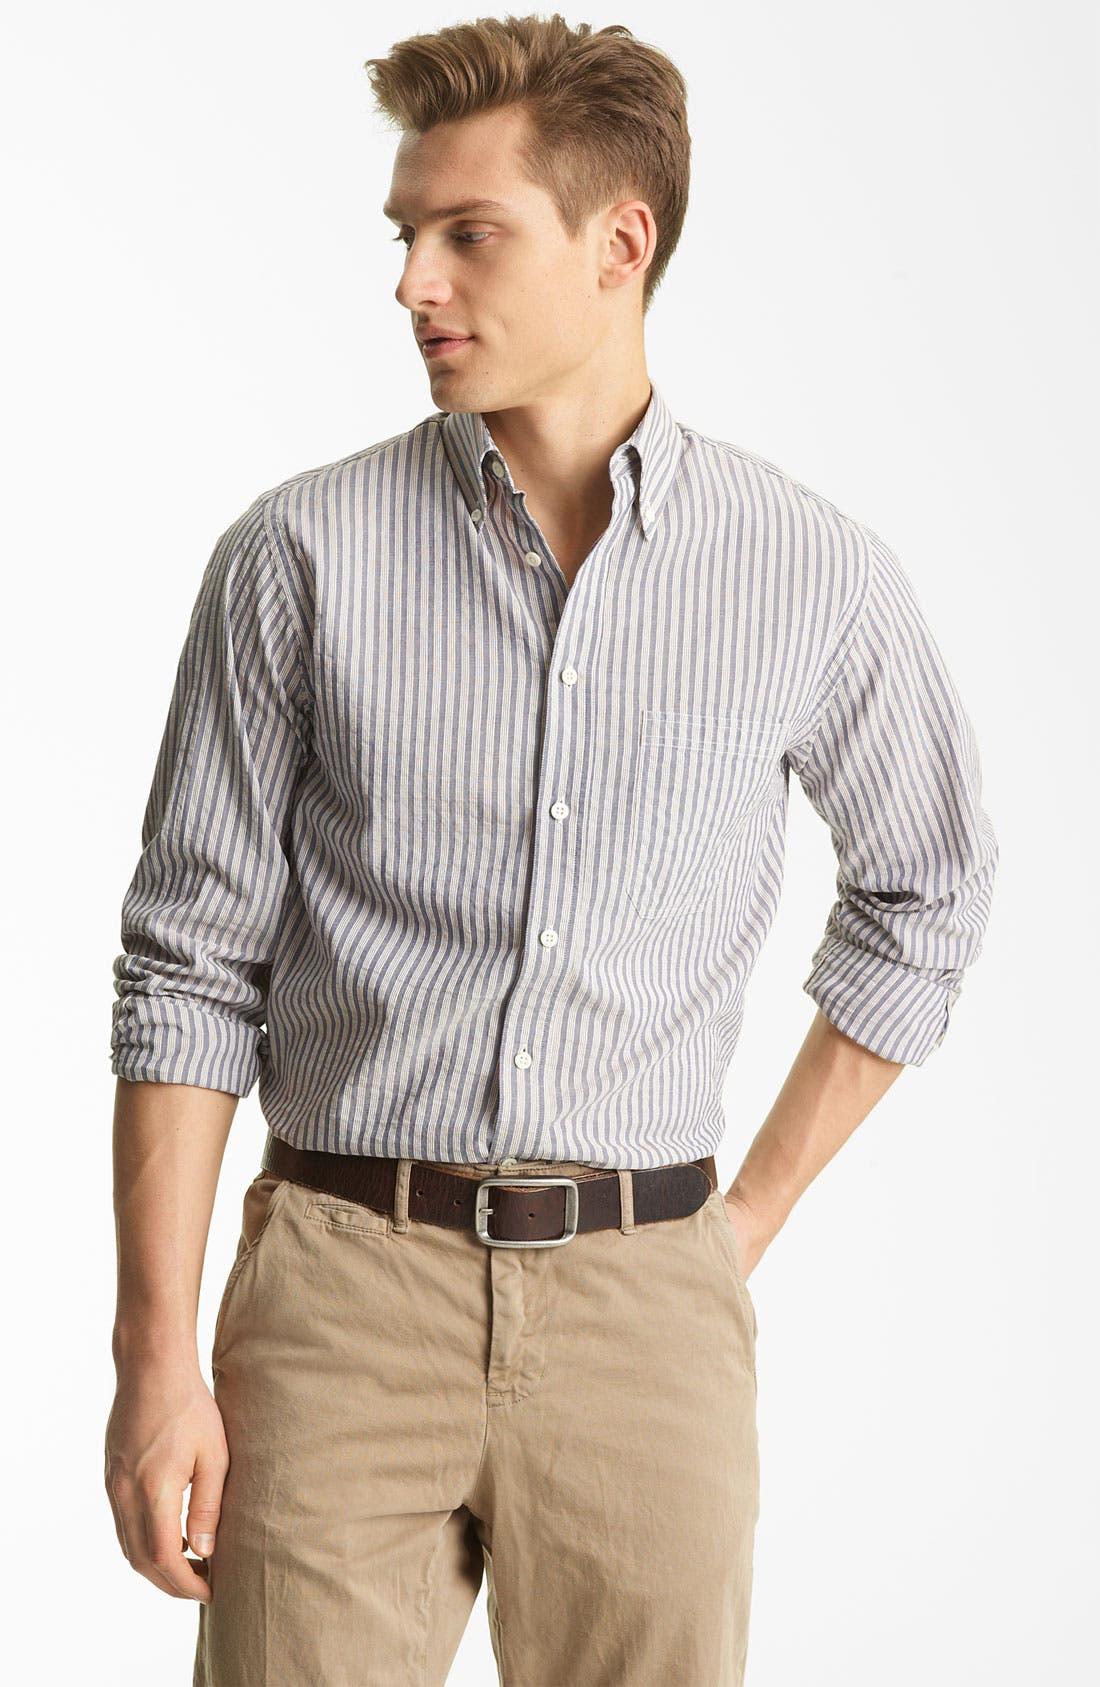 Alternate Image 1 Selected - Billy Reid 'Tuscumbia' Stripe Woven Shirt